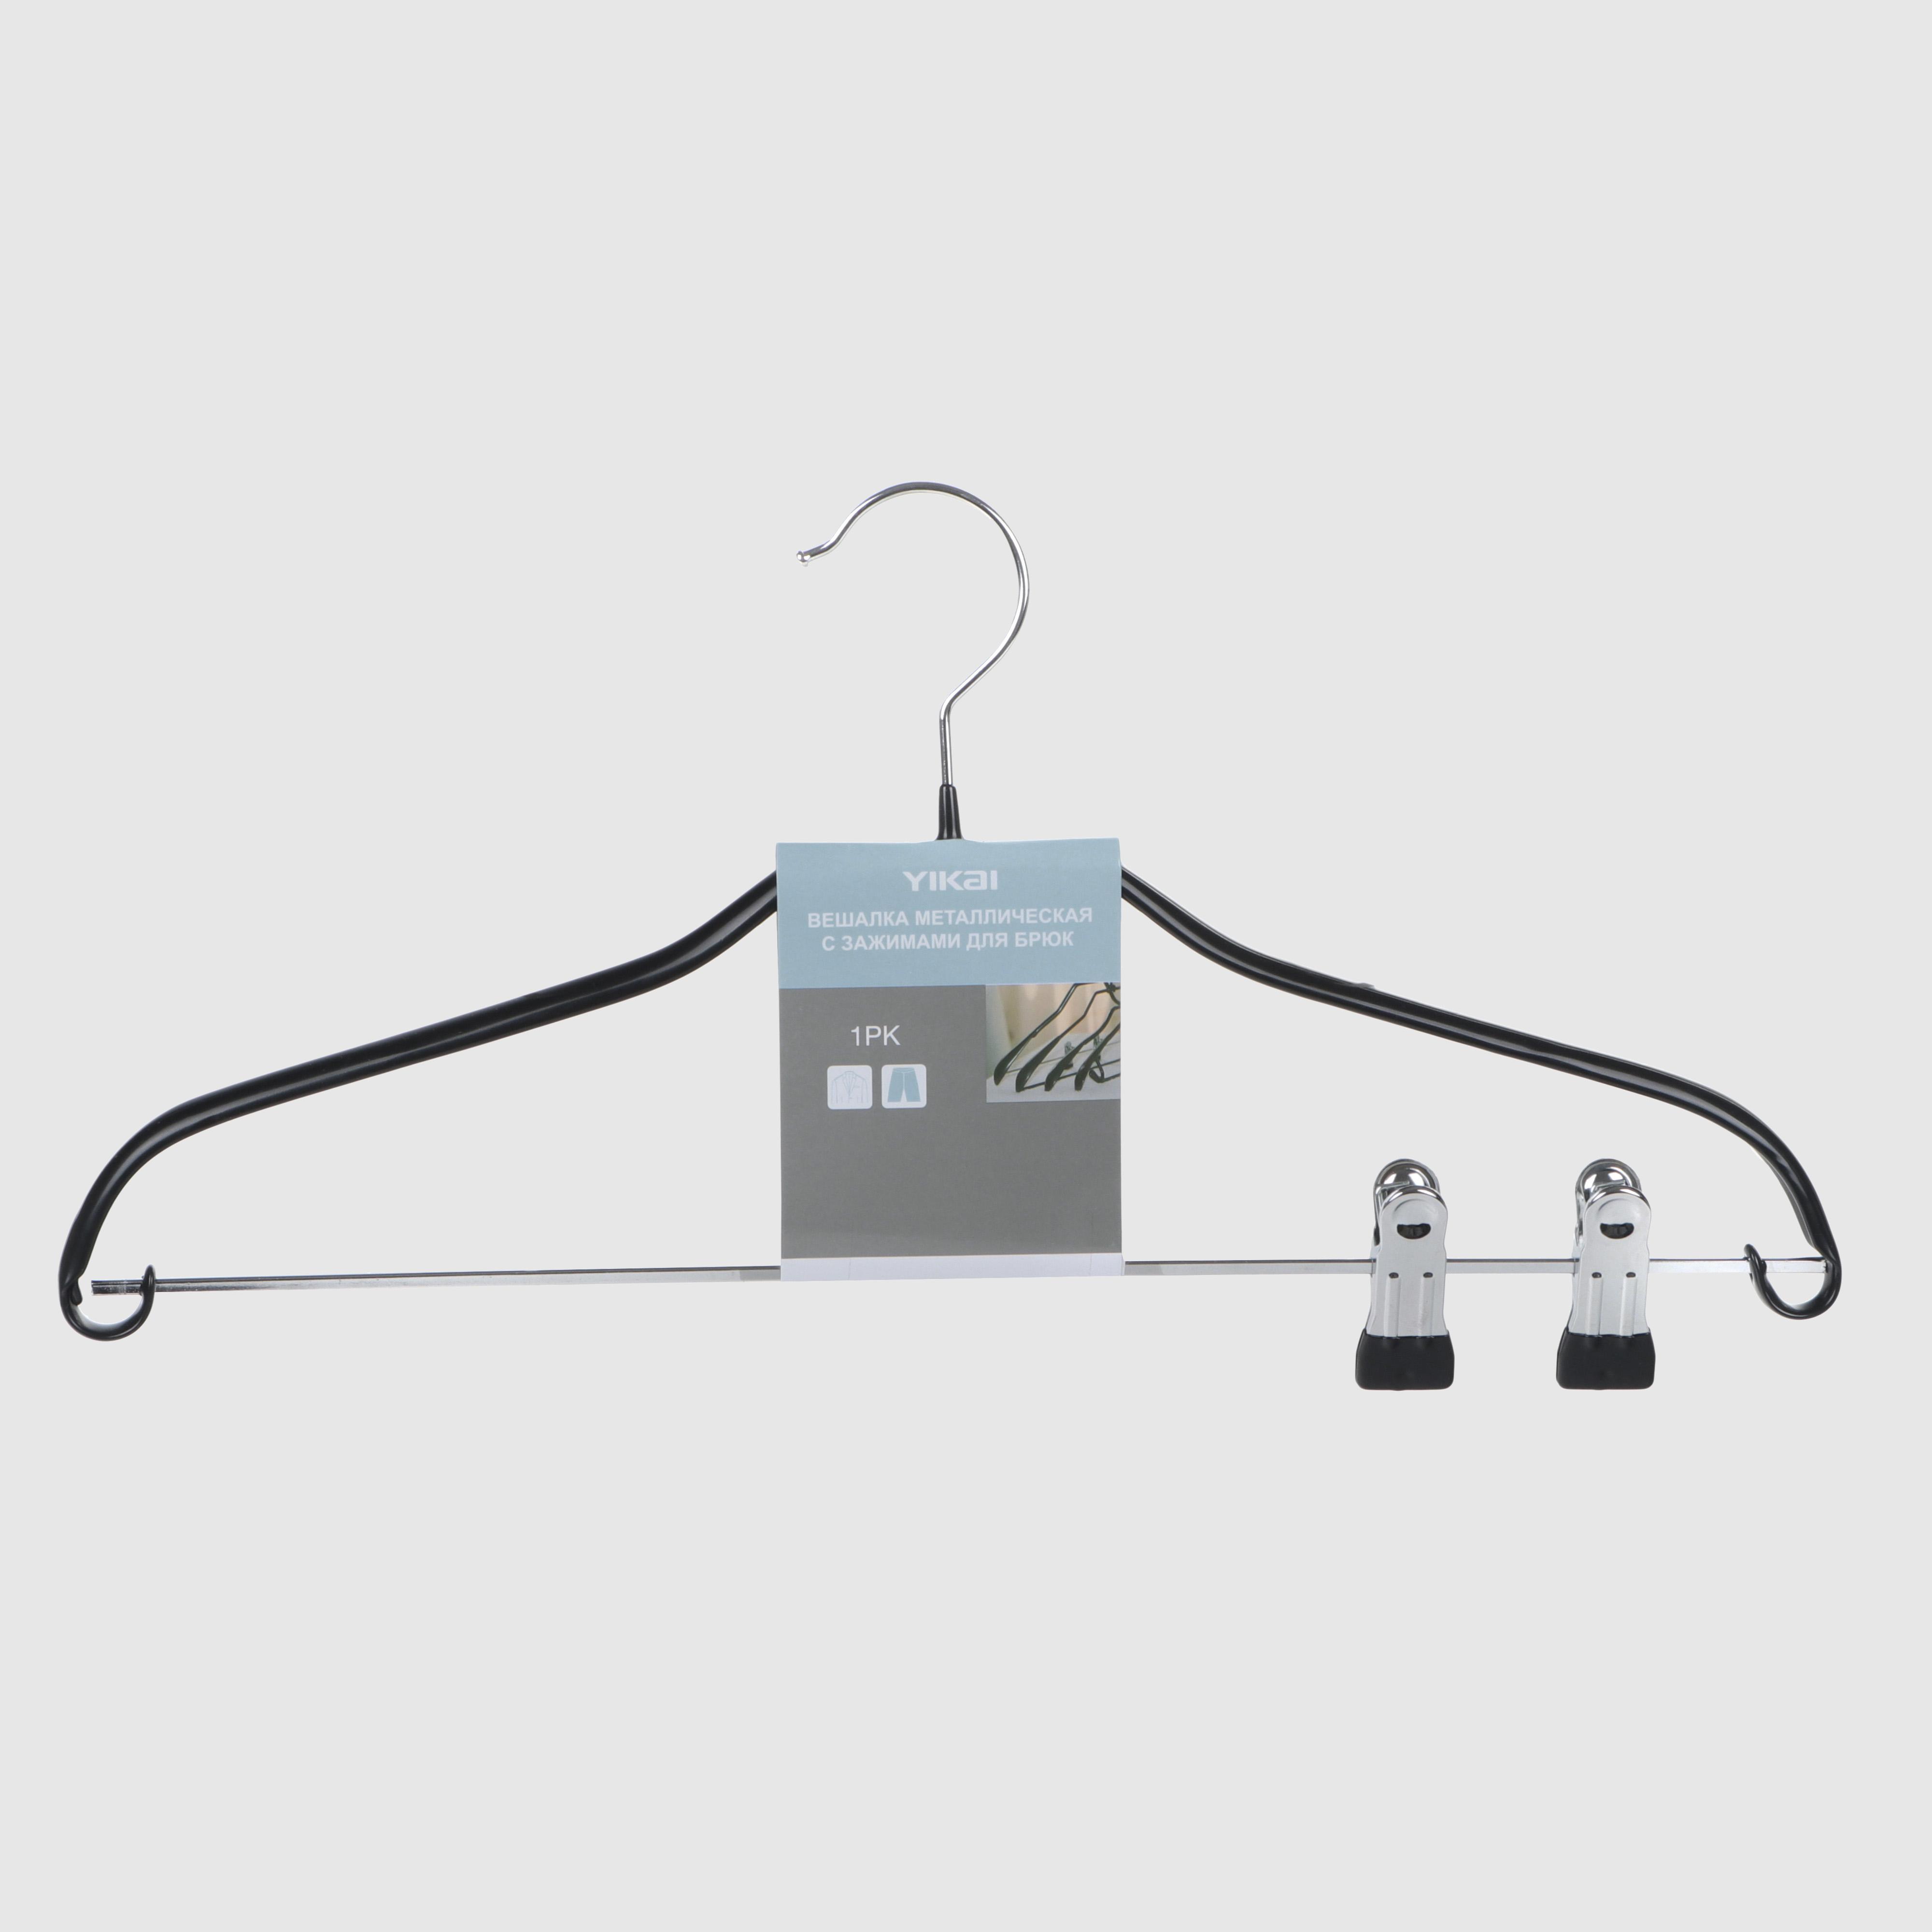 вешалка для брюк miolla с зажимами цвет металлик черный длина 35 см Вешалка с зажимами для брюк Yikai